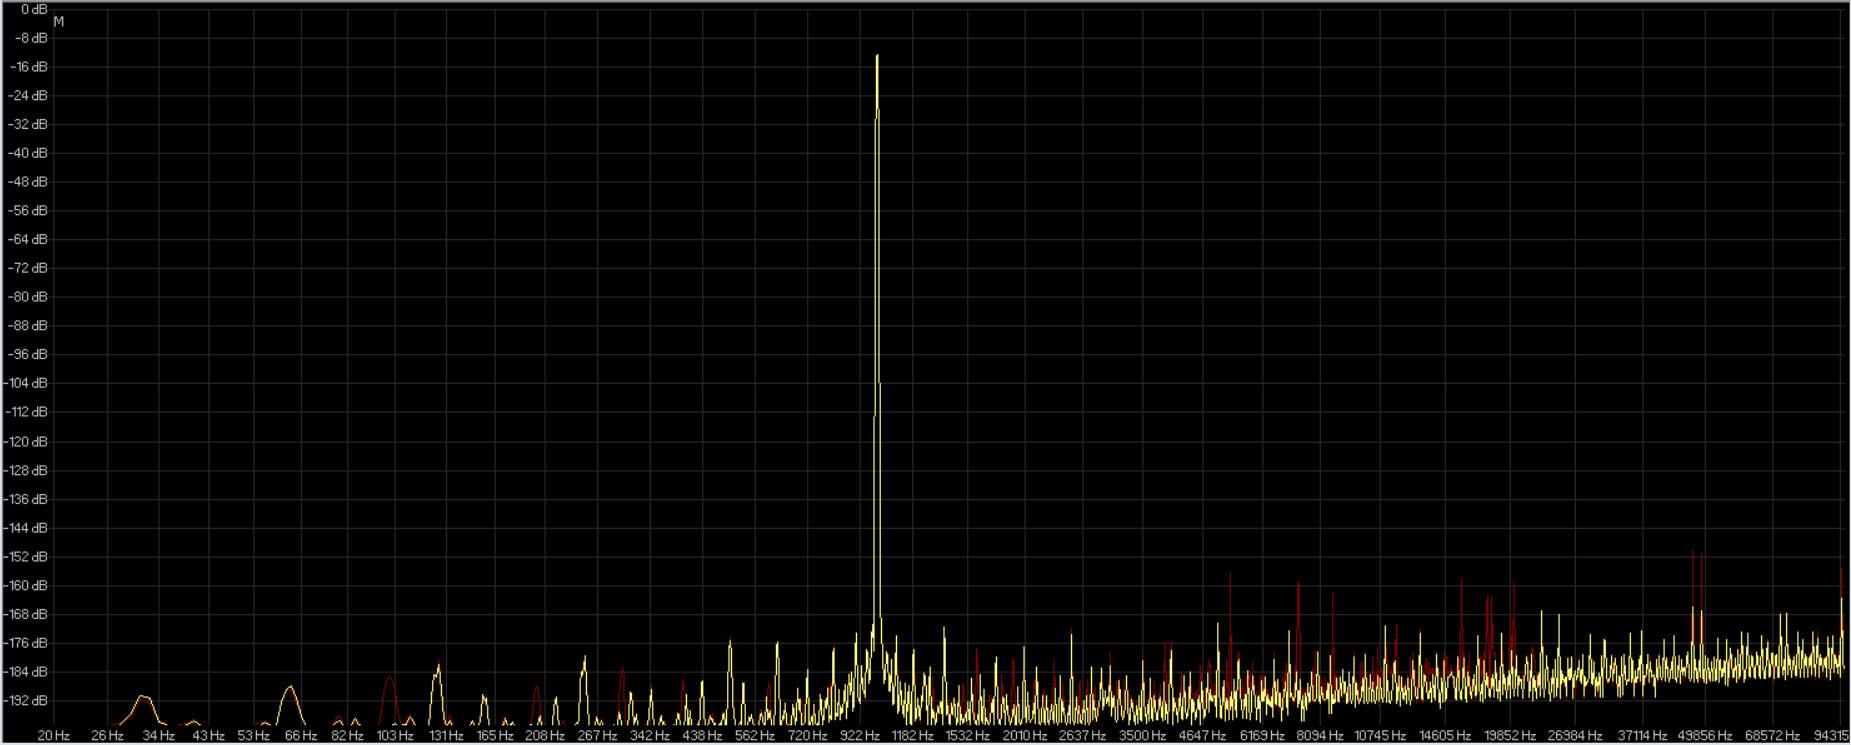 32-4.4.1 saracon ( giallo ) wavelab 6 ( rosso ).jpg